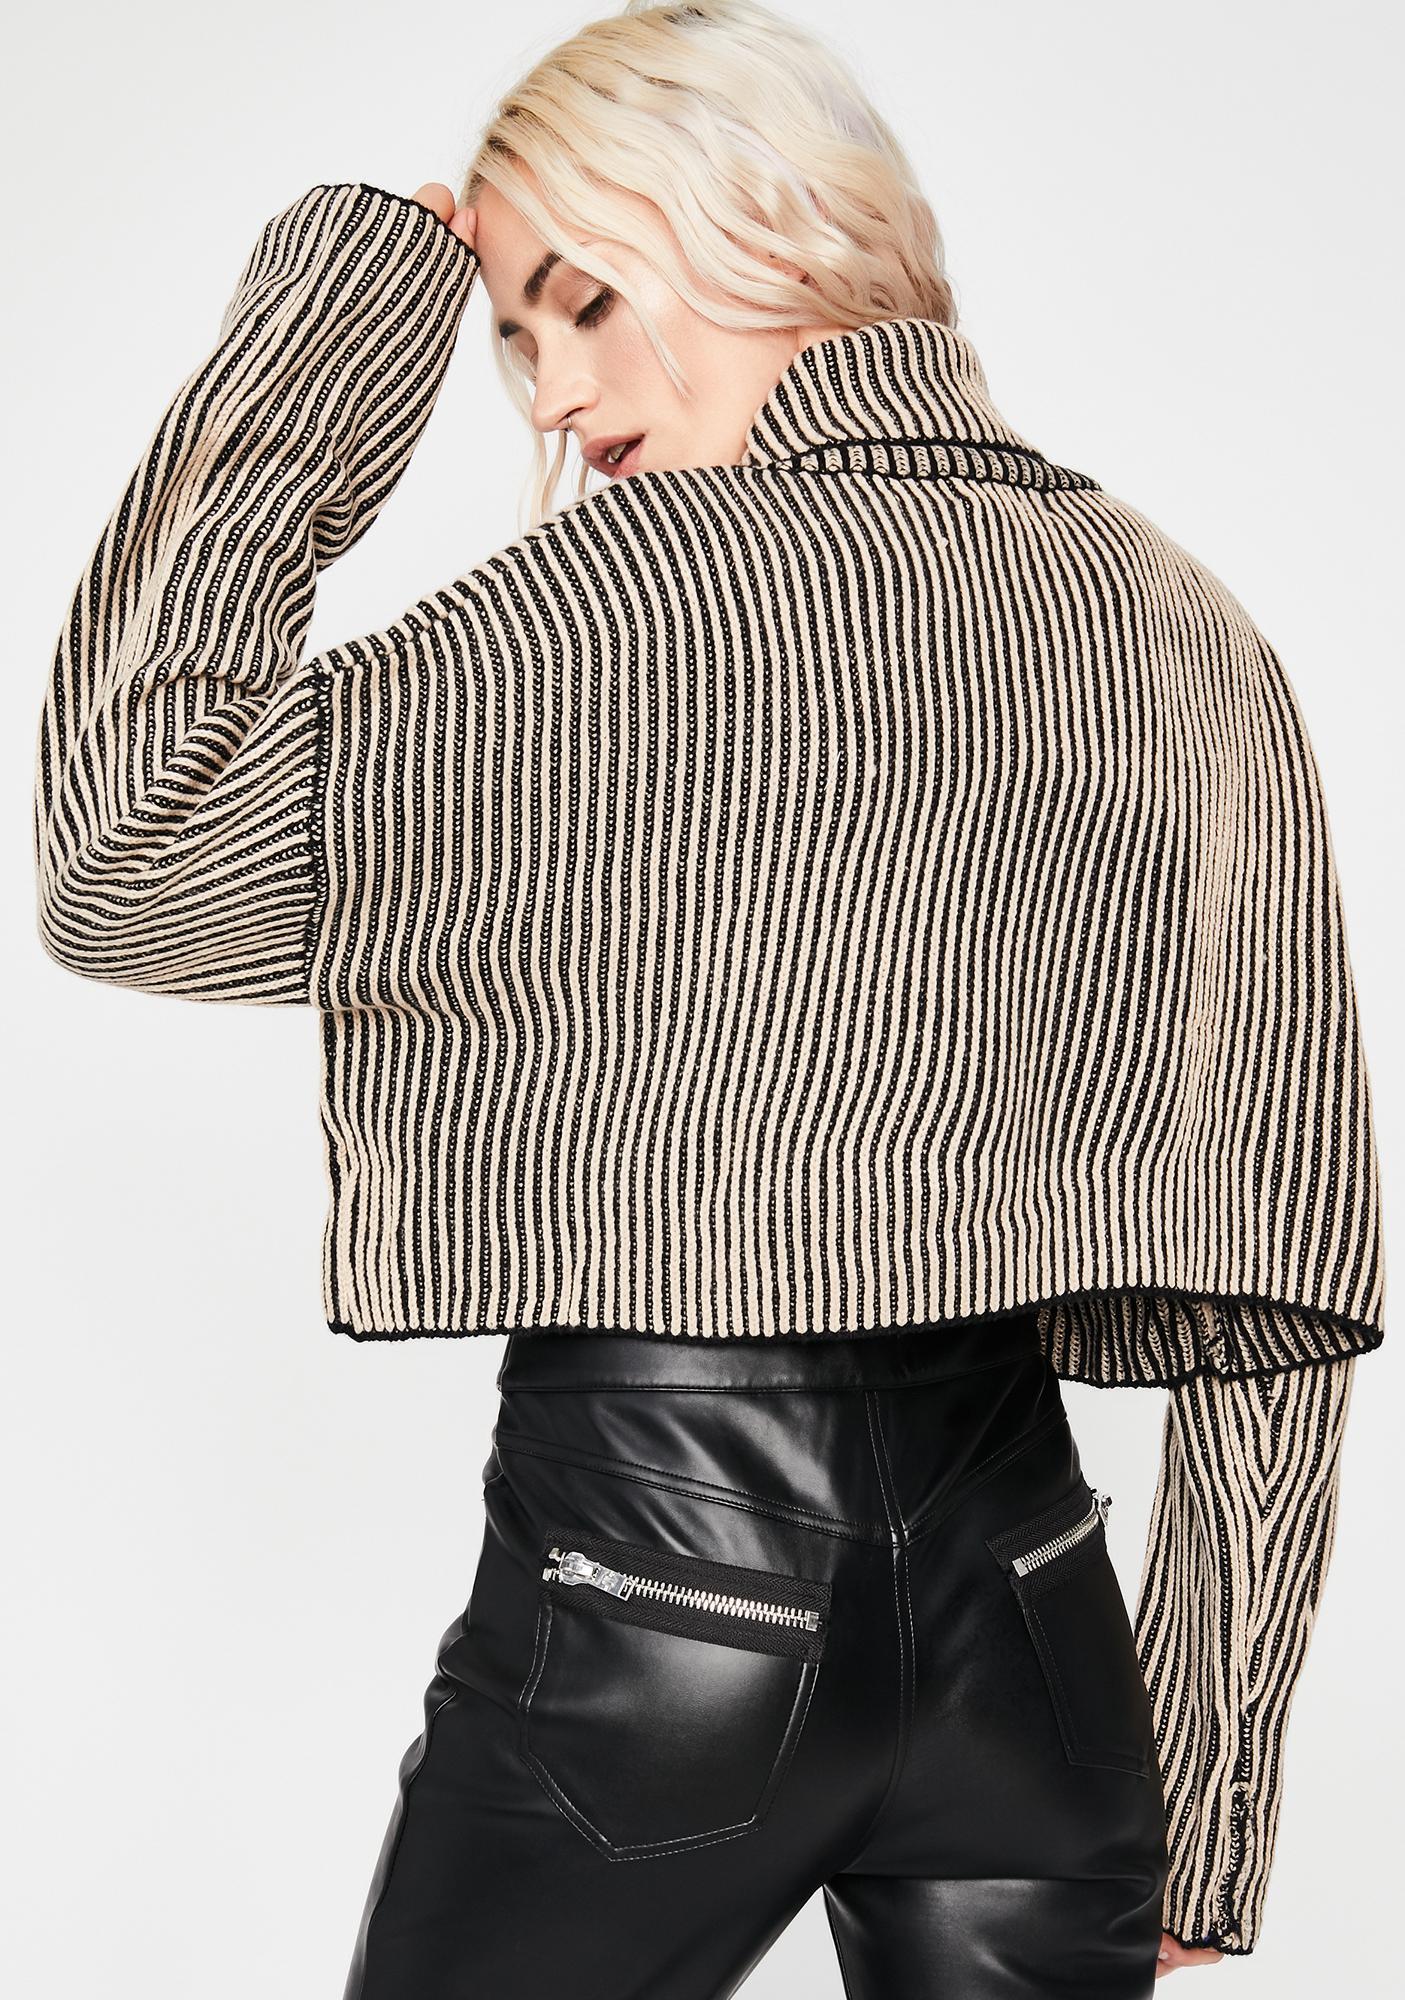 New Mint Velvet Ivory /& Ink Stripe Zip Monochrome Piped Top Shirt Blouse Tee £79